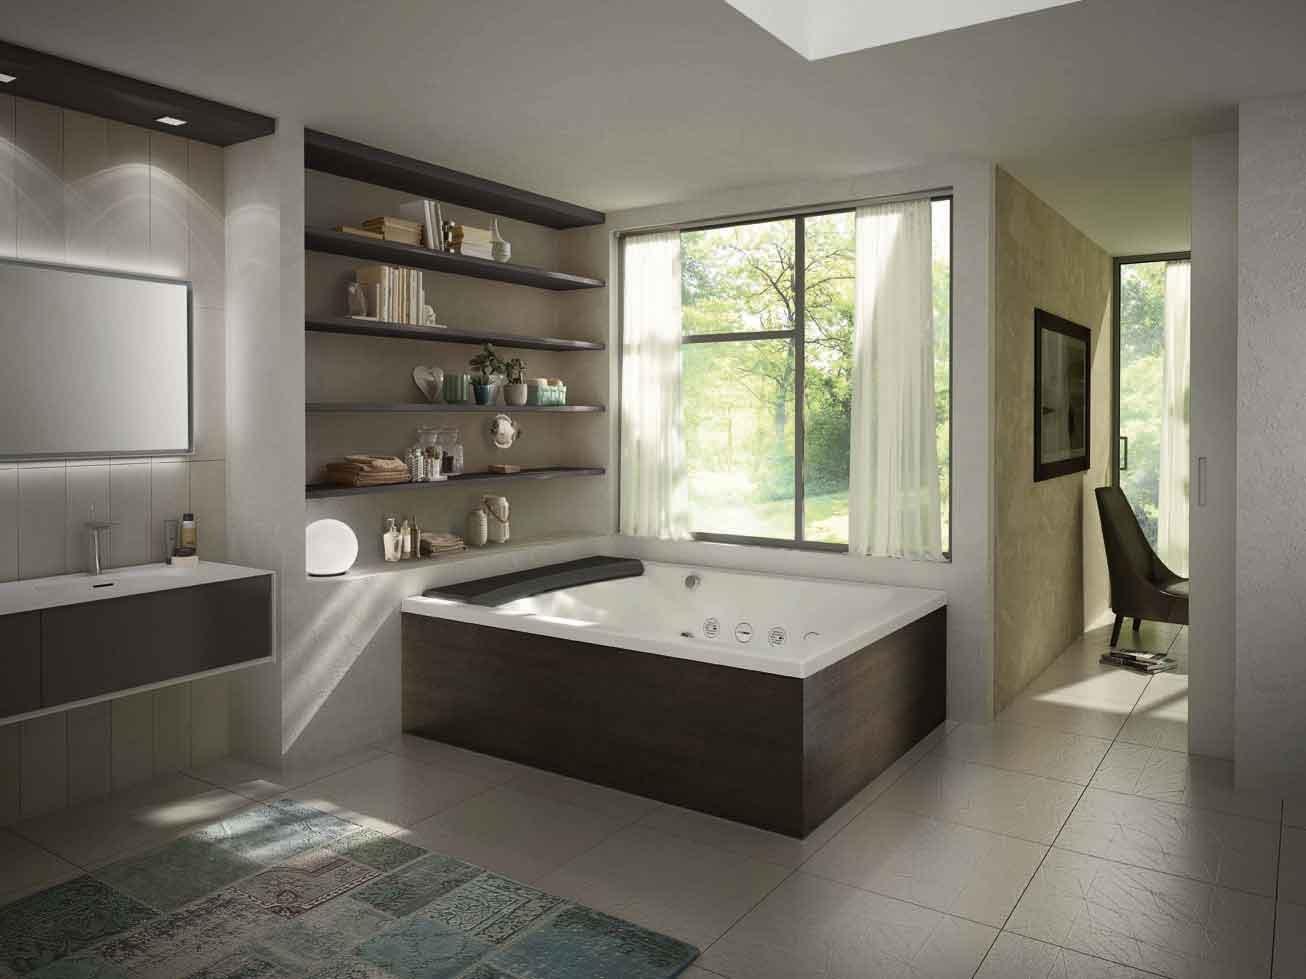 Vasche per ogni esigenza di spazio cose di casa - Vasca da bagno incasso prezzi ...